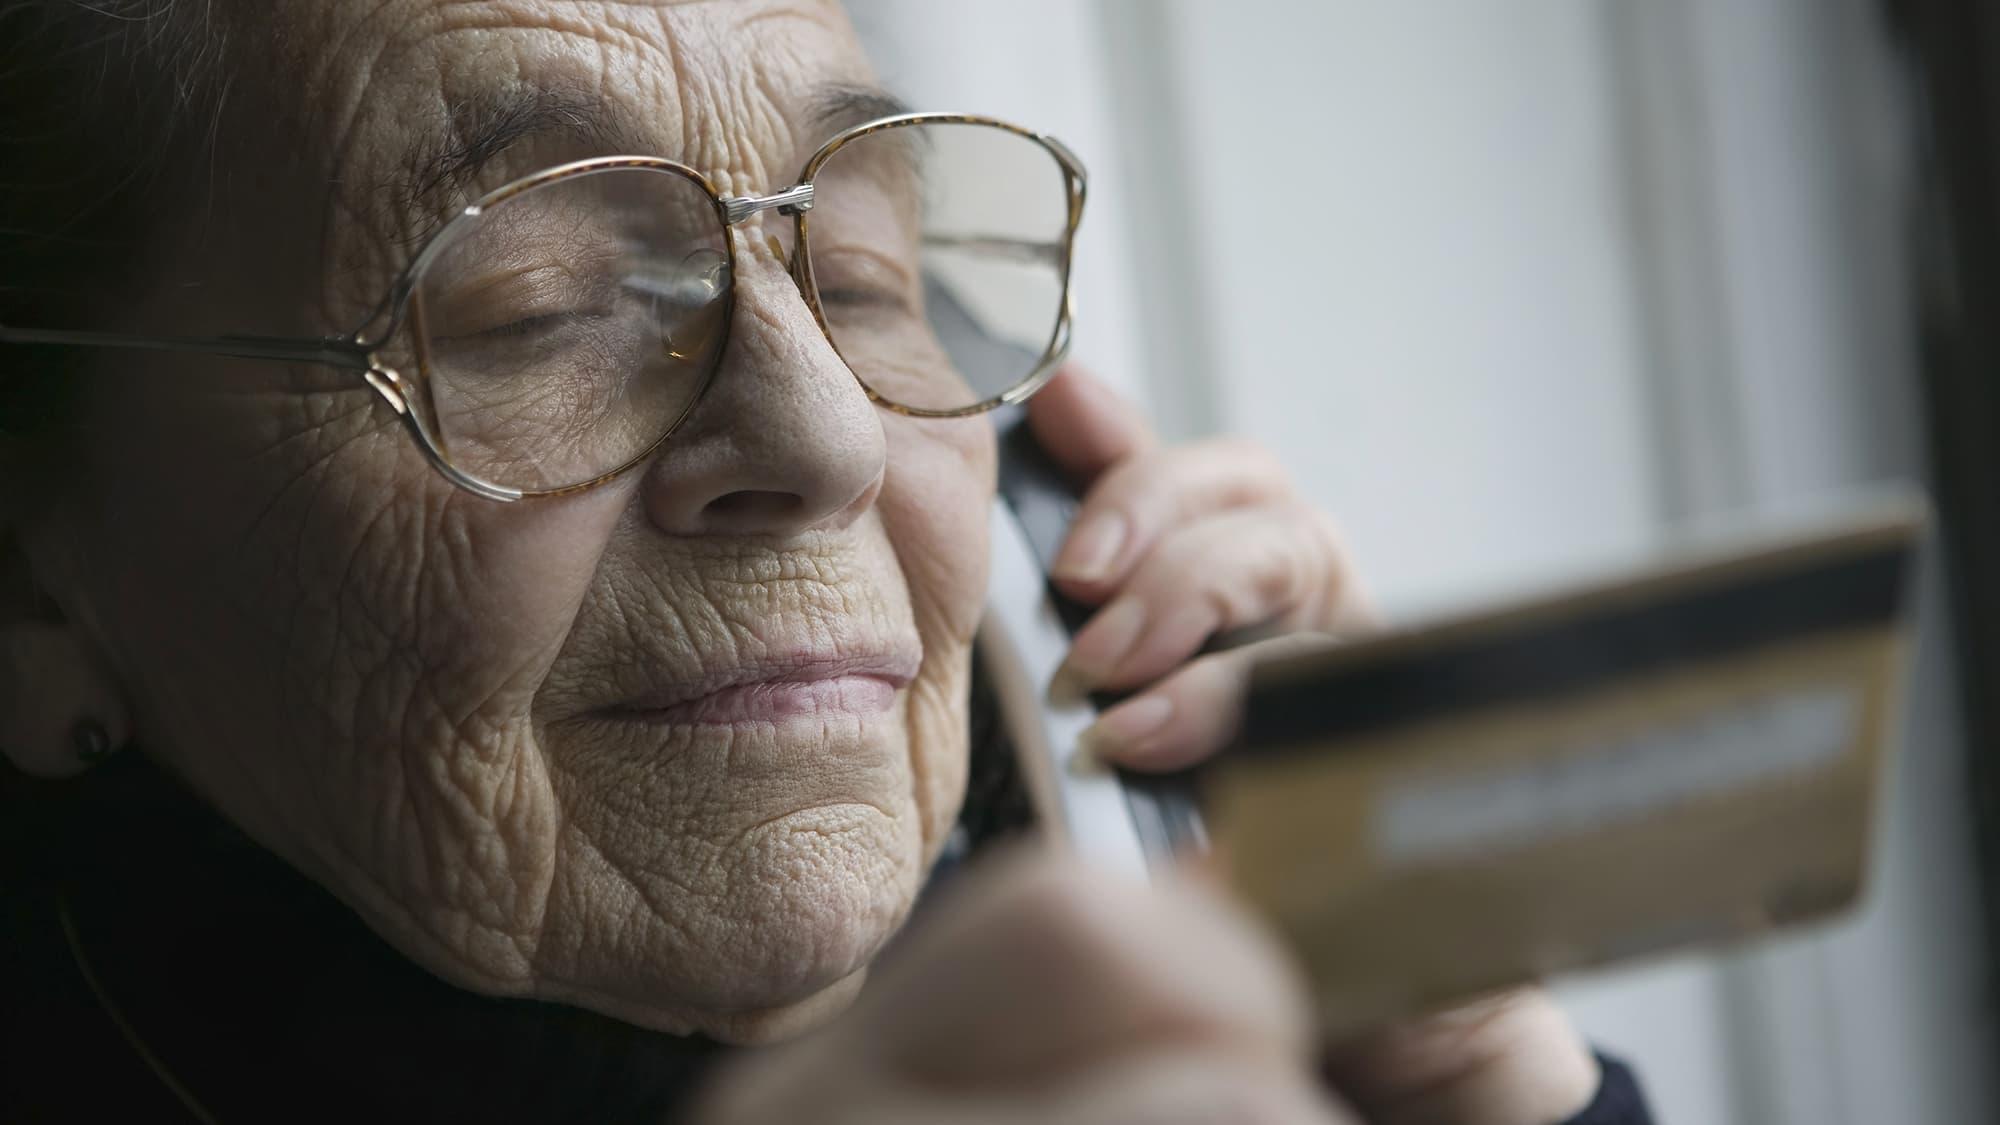 Asian ladies online dating ukraine scams elderly